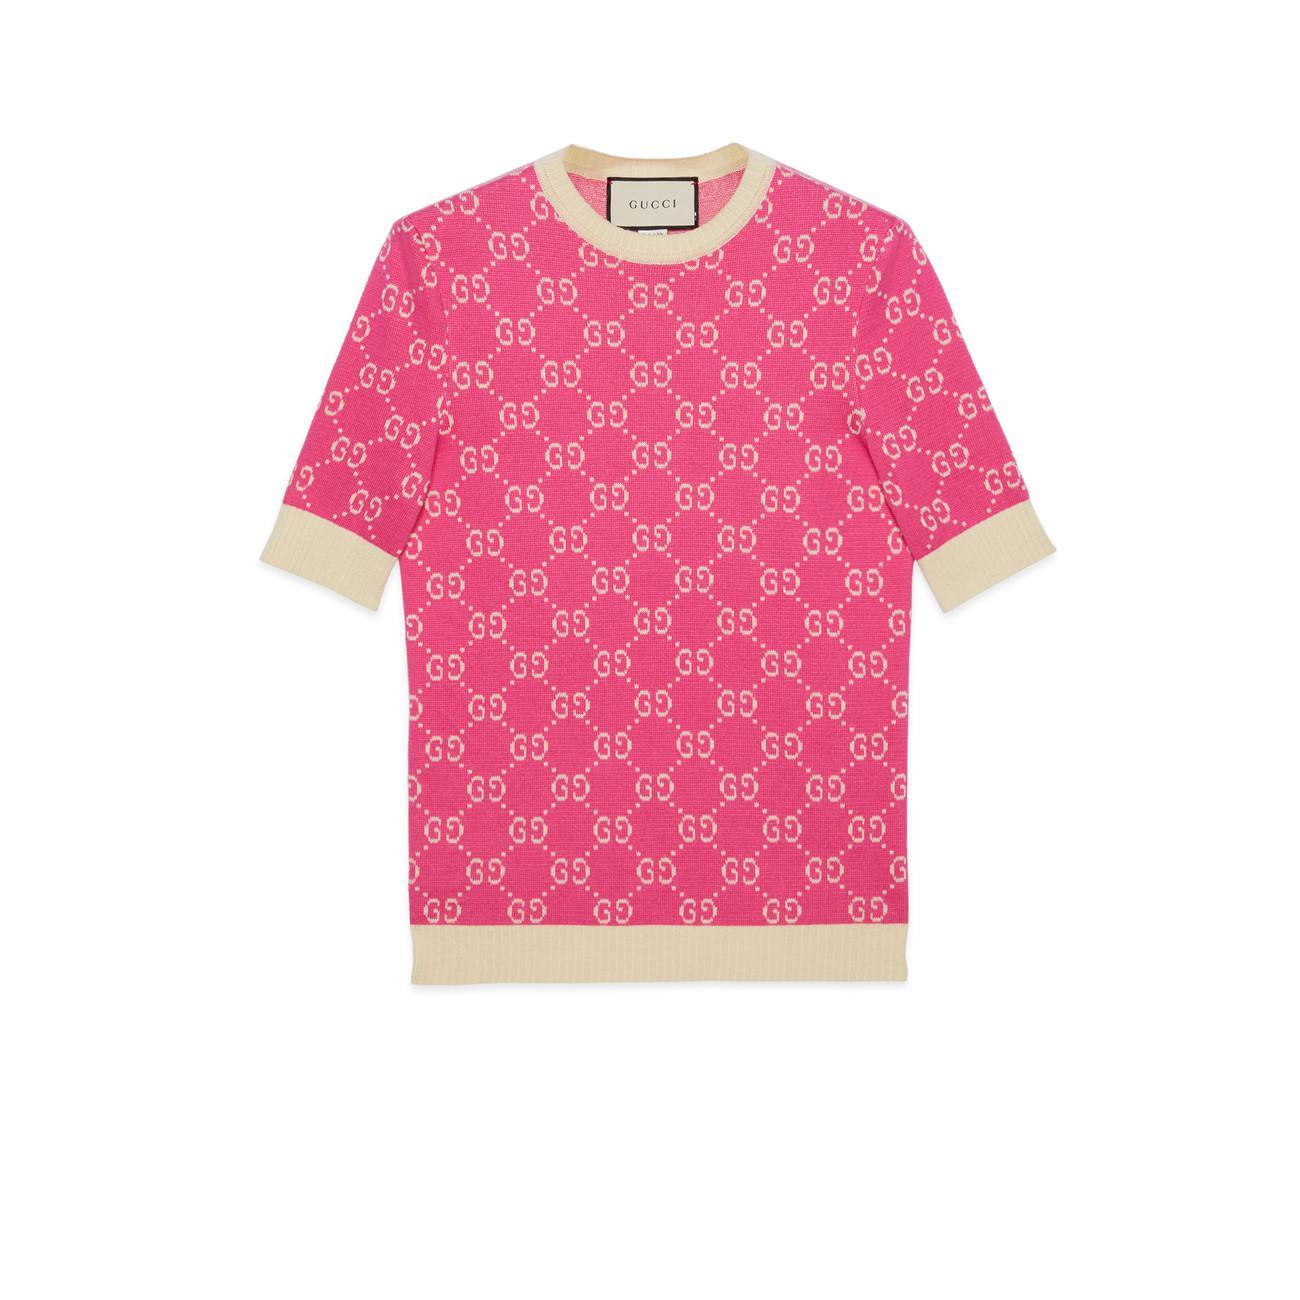 96ad516ac0a Gucci - Pink GG Jacquard Cotton Top - Lyst. View fullscreen